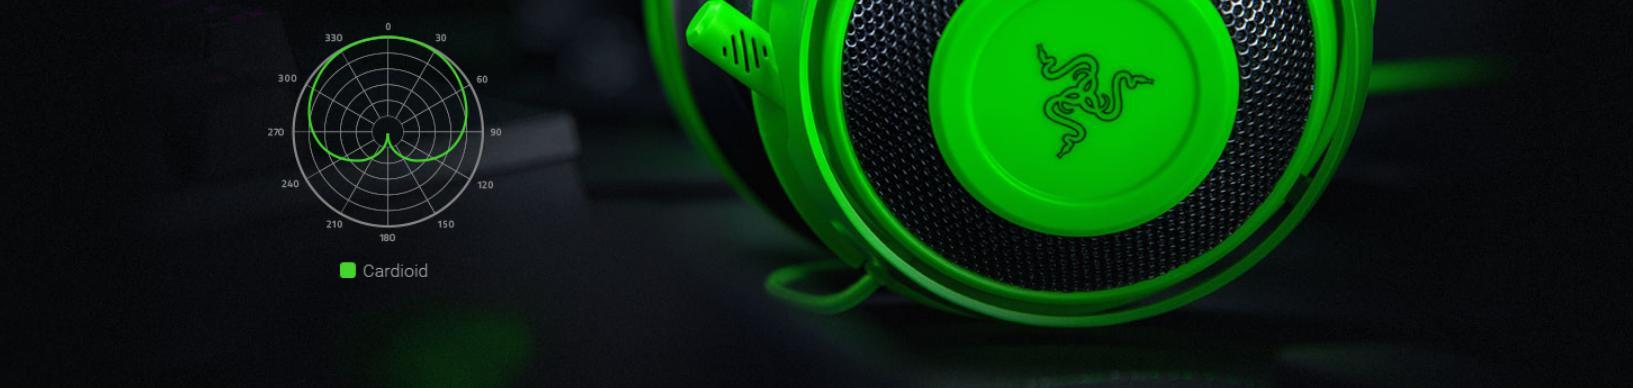 Tai nghe Razer Kraken Multi-Platform Wired Mercury RZ04-02830400-R3M1 trang bị micro cao cấp